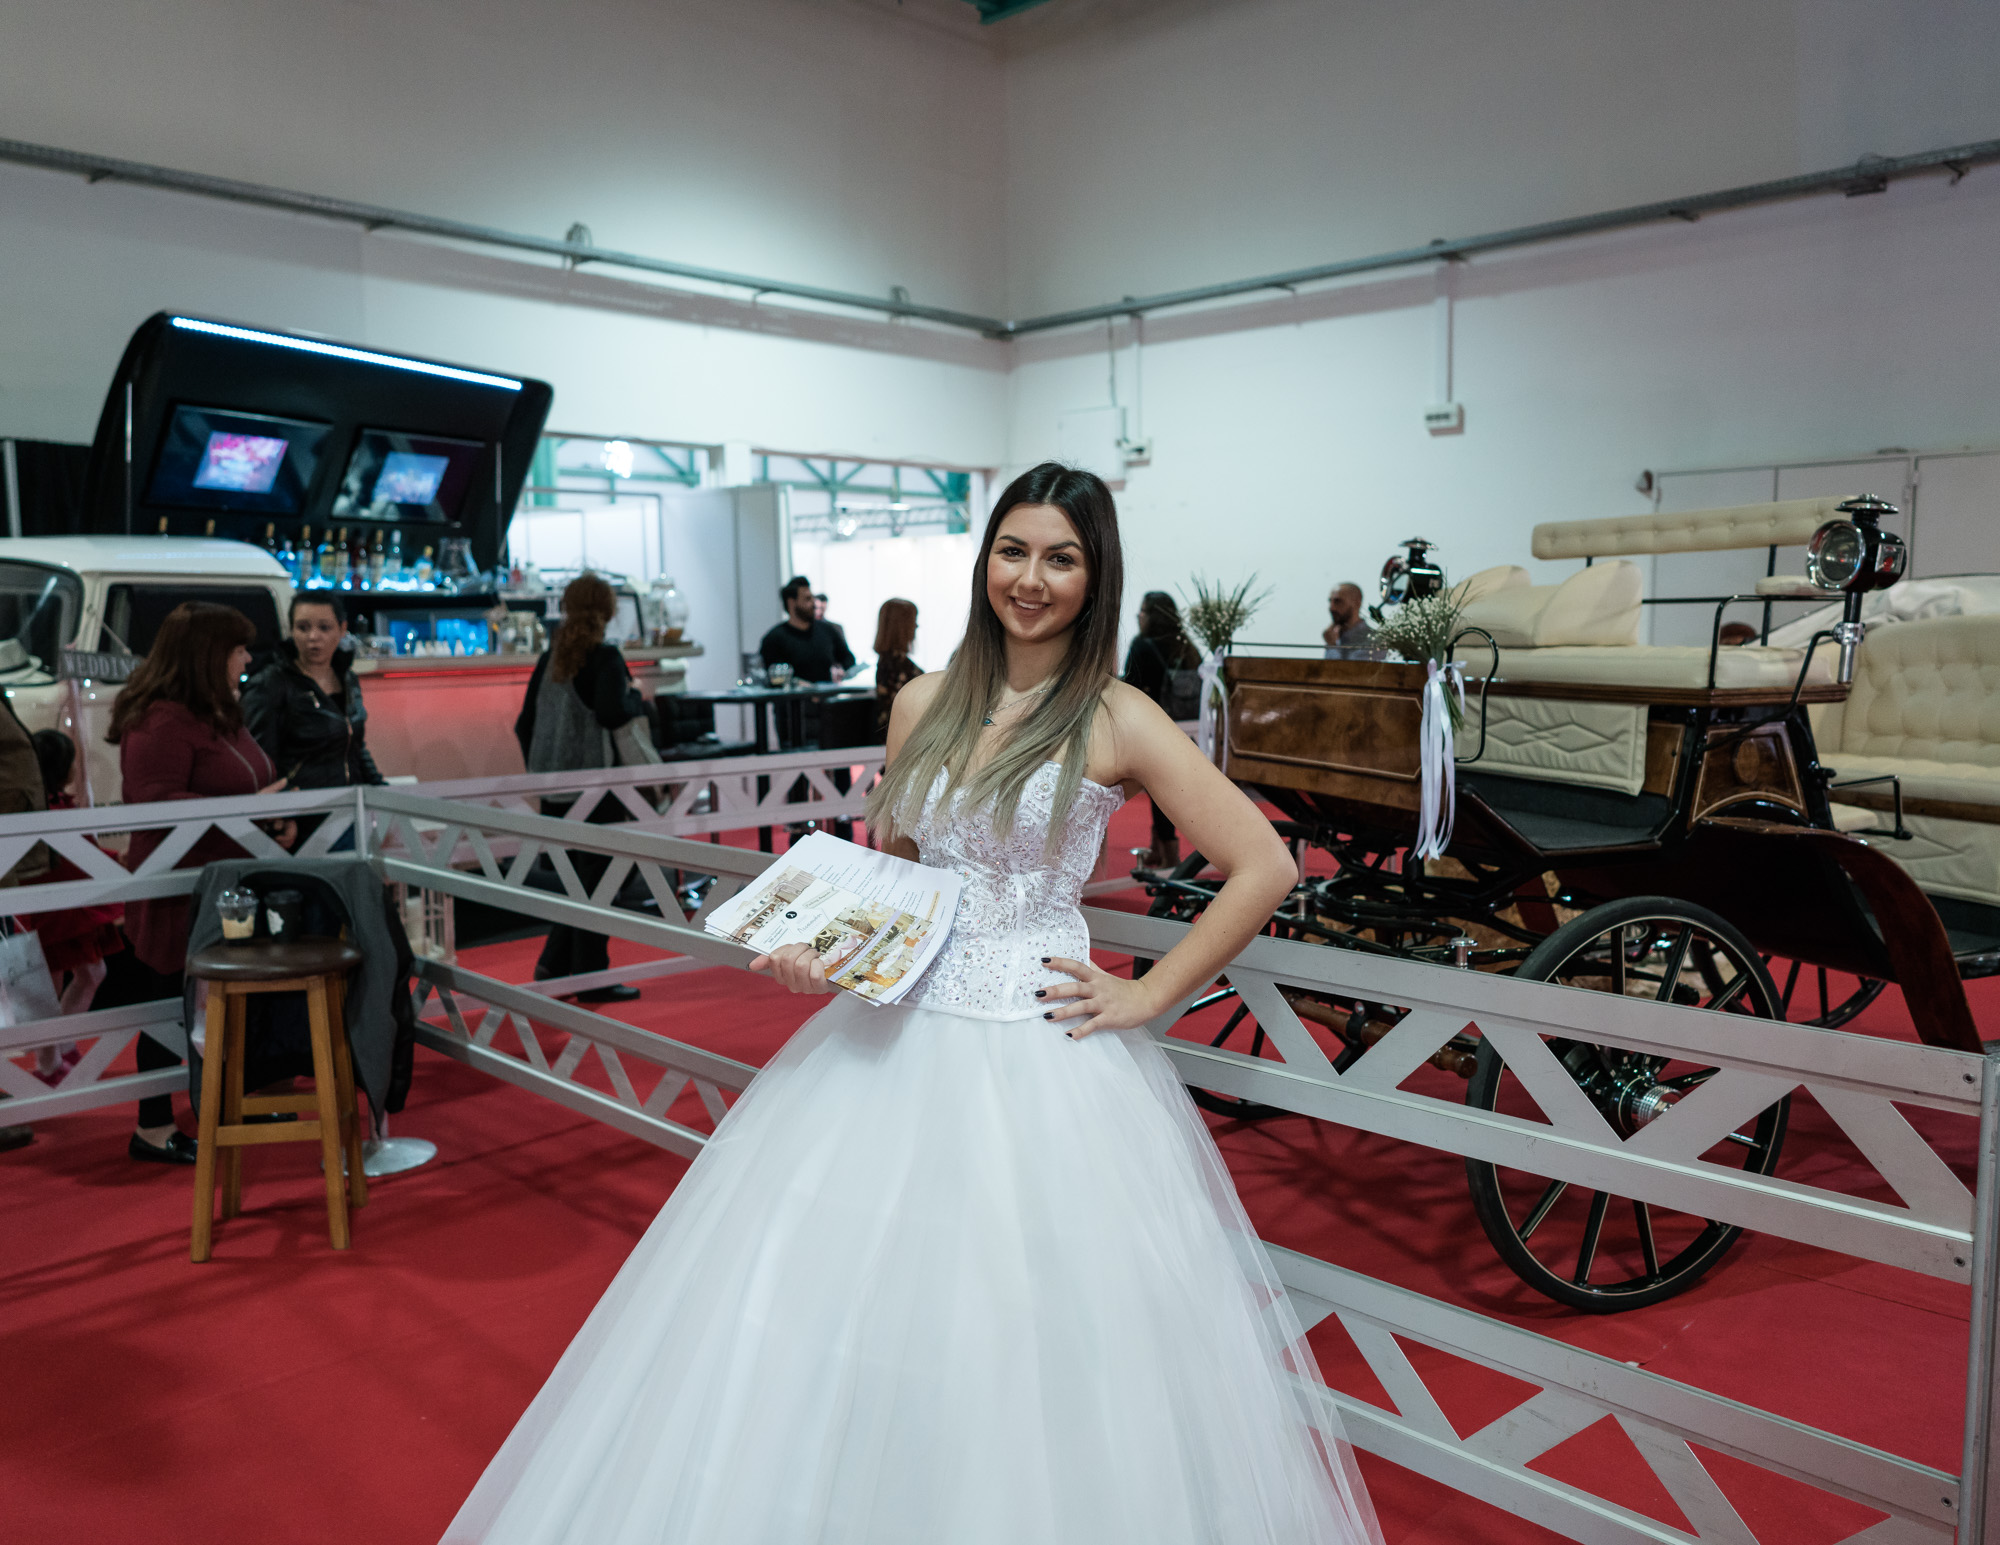 a1ccf91cdcc2 Όλα όσα Έμαθα για την Ελληνική Βιομηχανία του Γάμου Προσπαθώντας να ...